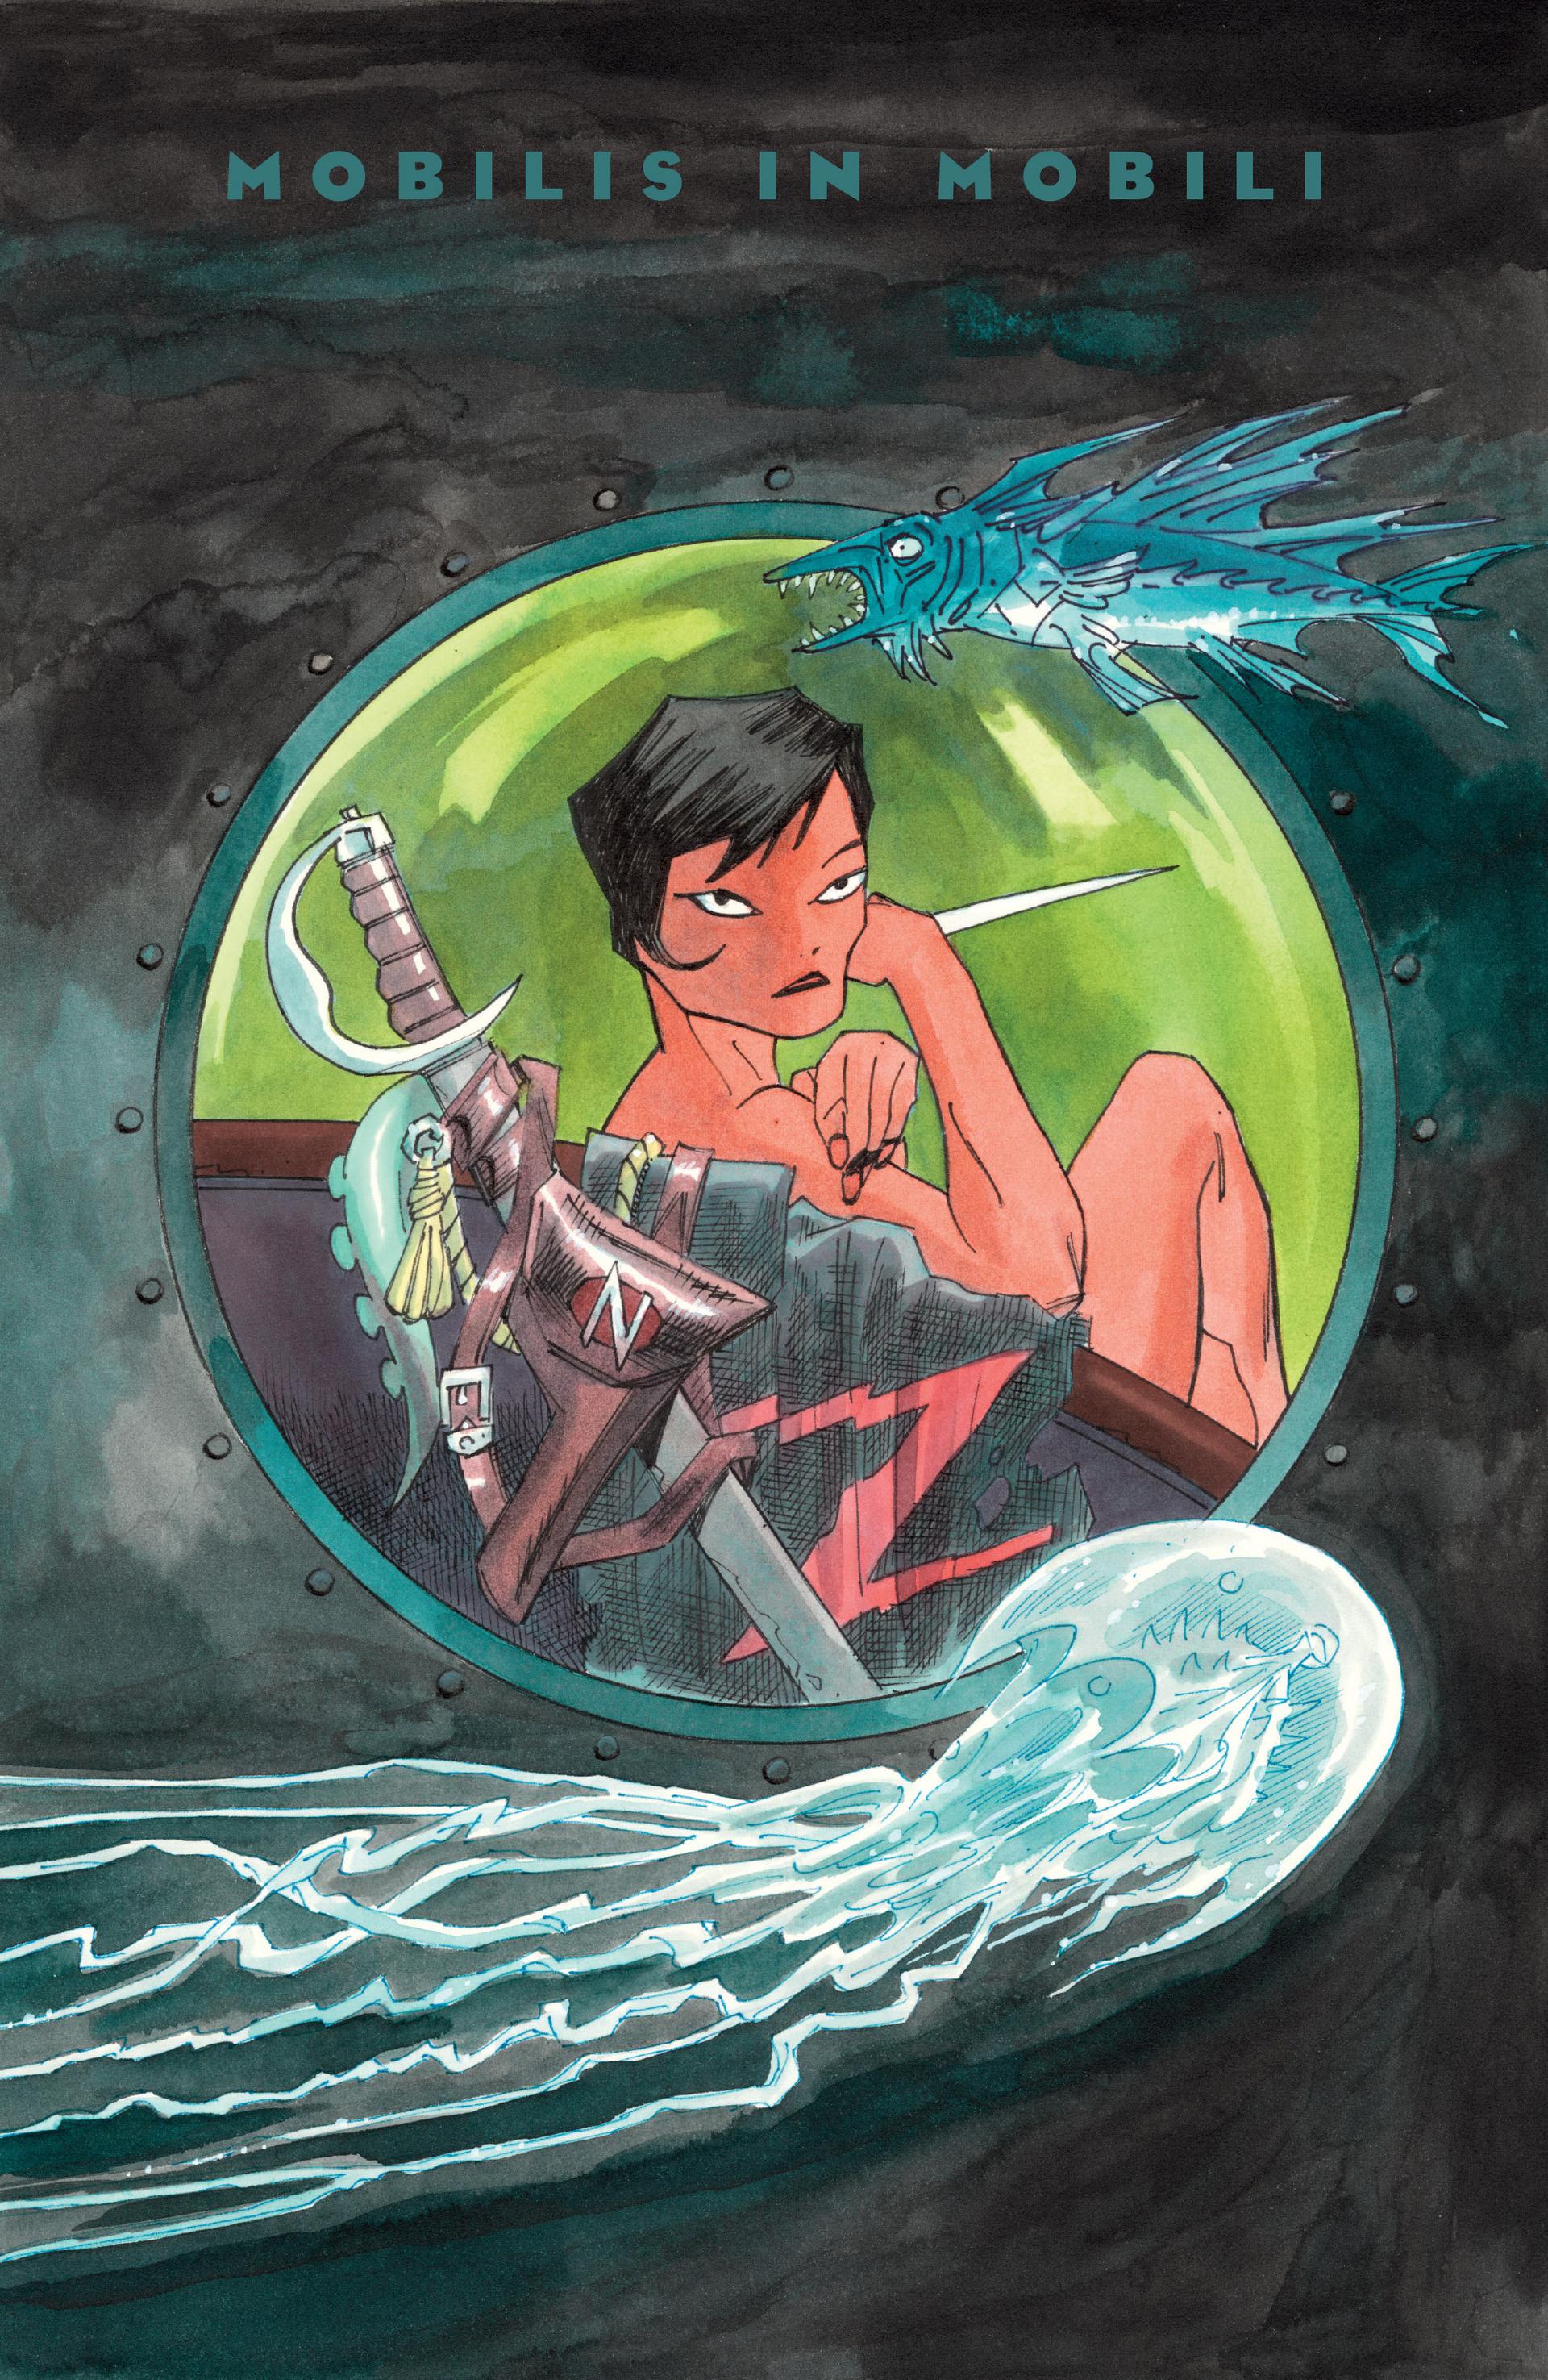 Read online Nemo: Heart of Ice comic -  Issue # Full - 4